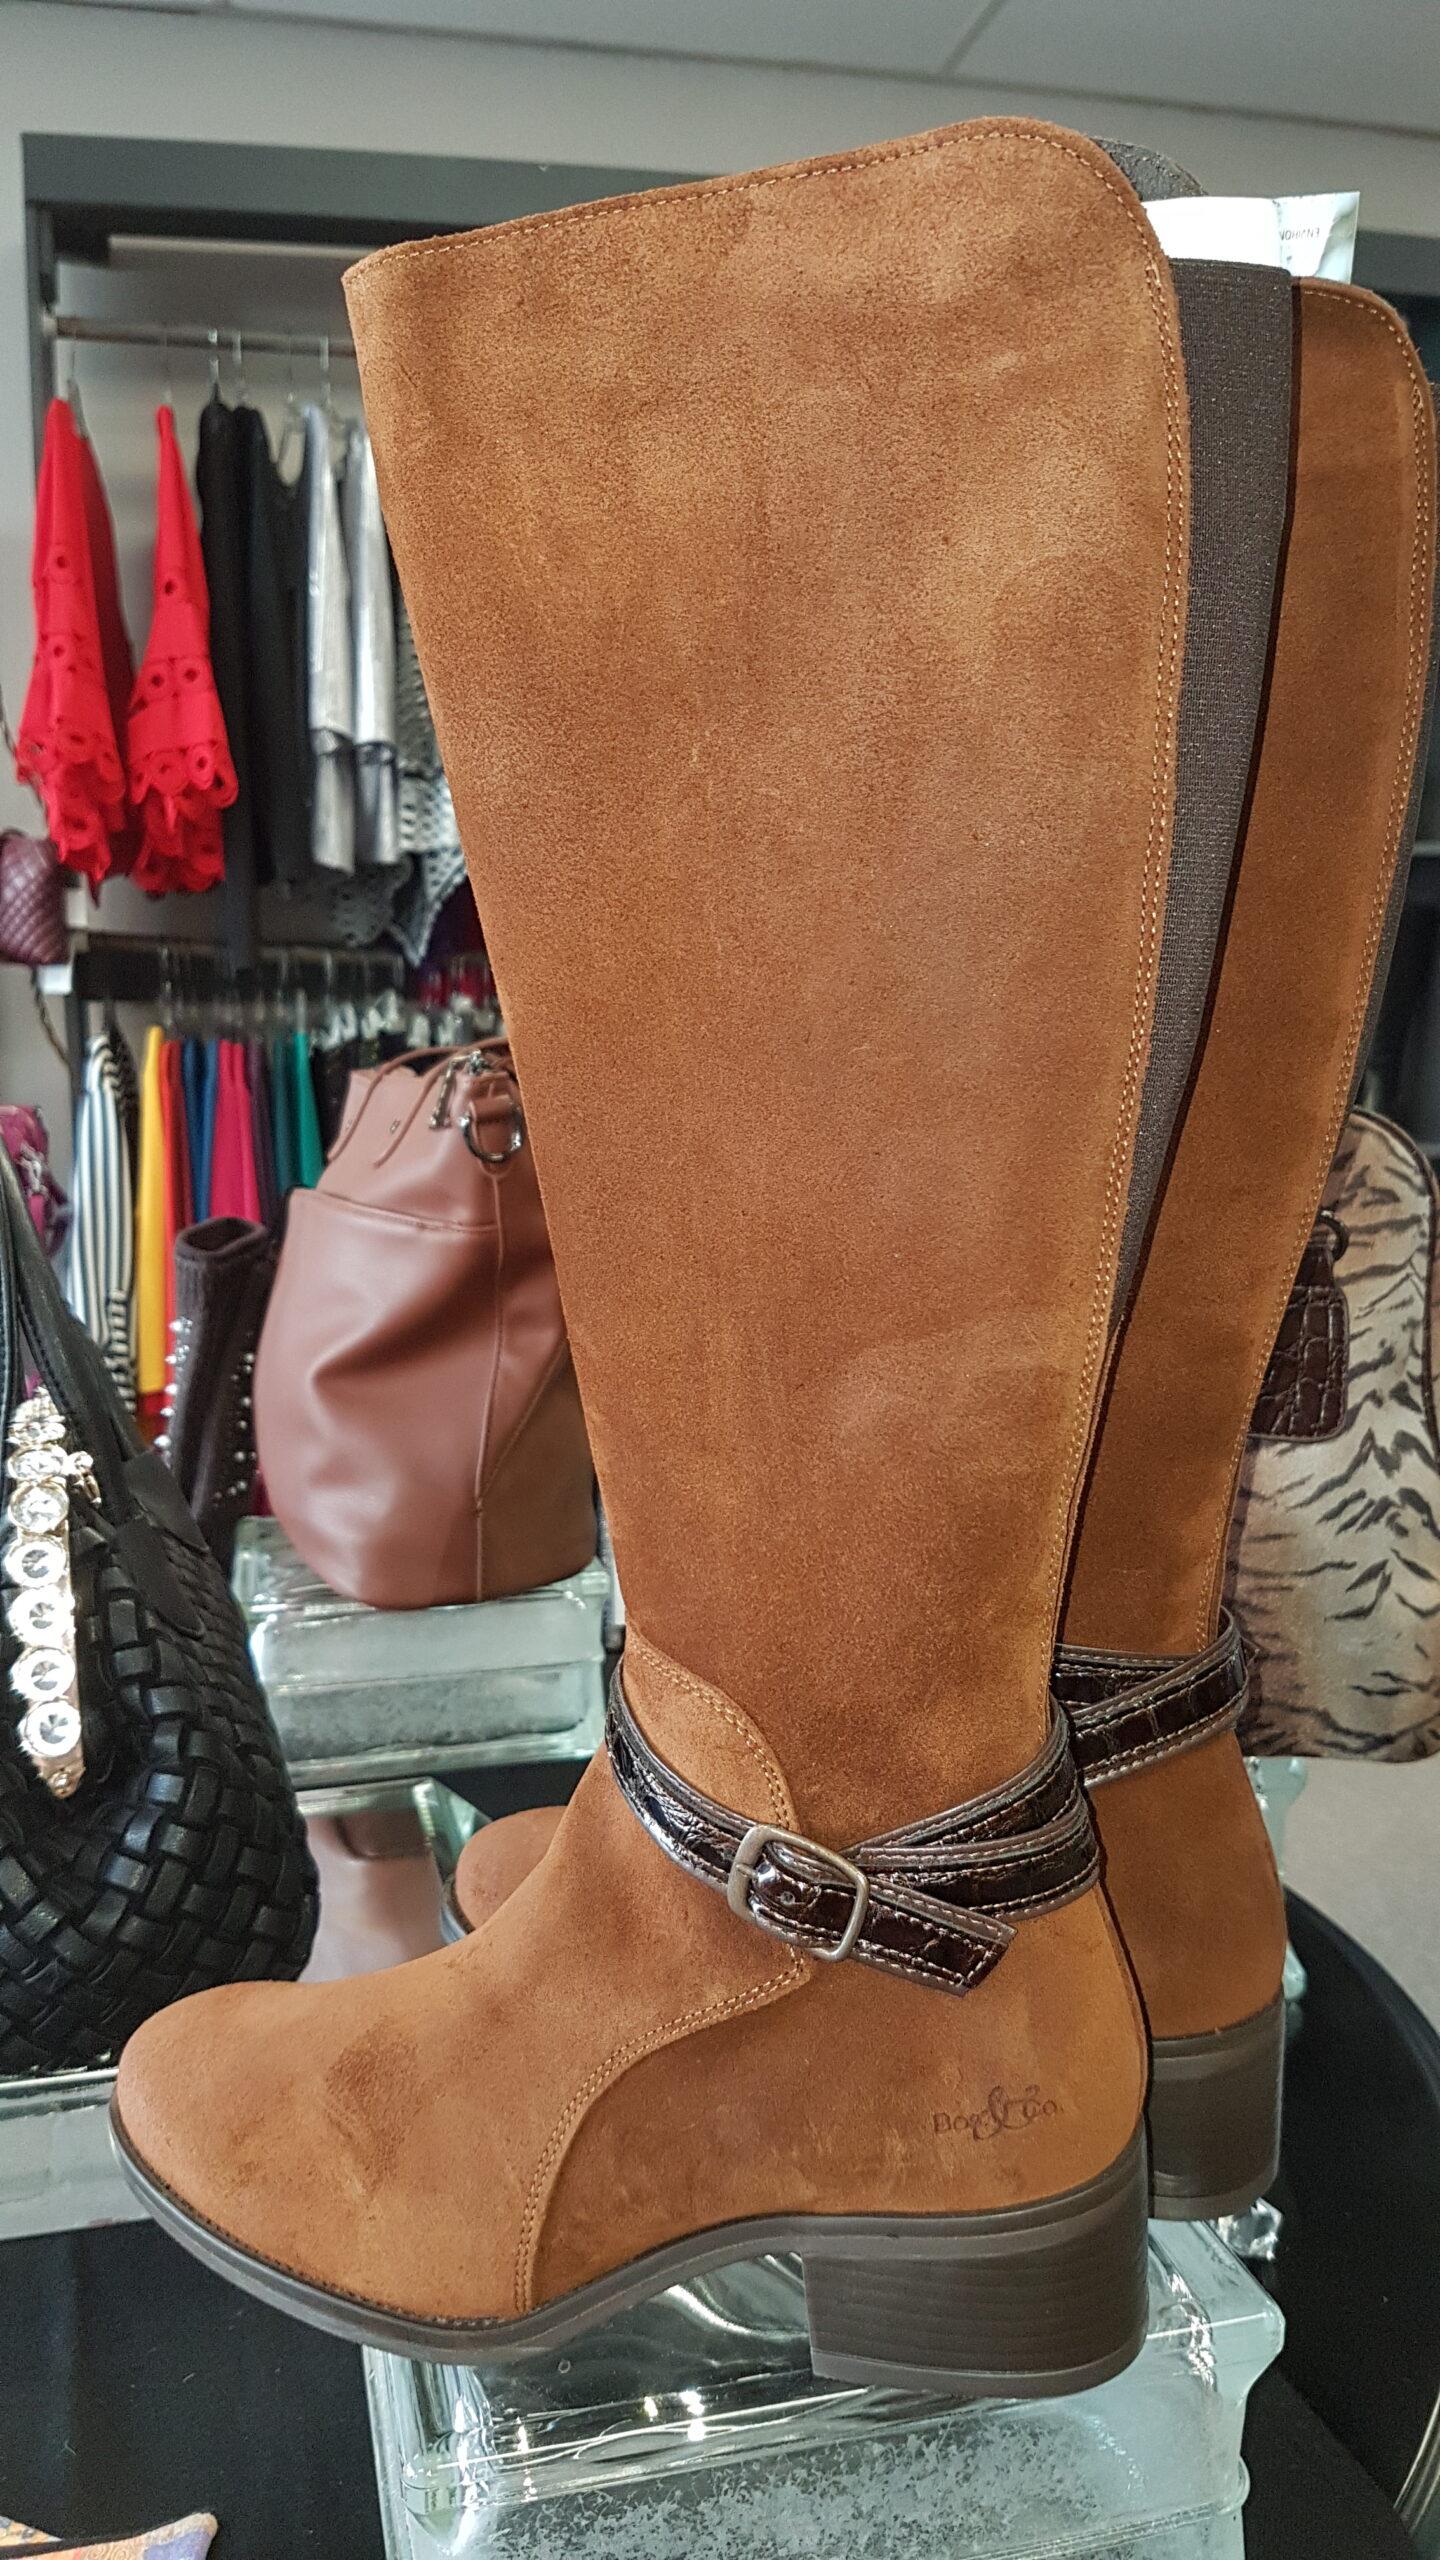 Side view of Suede Knee High Waterproof Boots